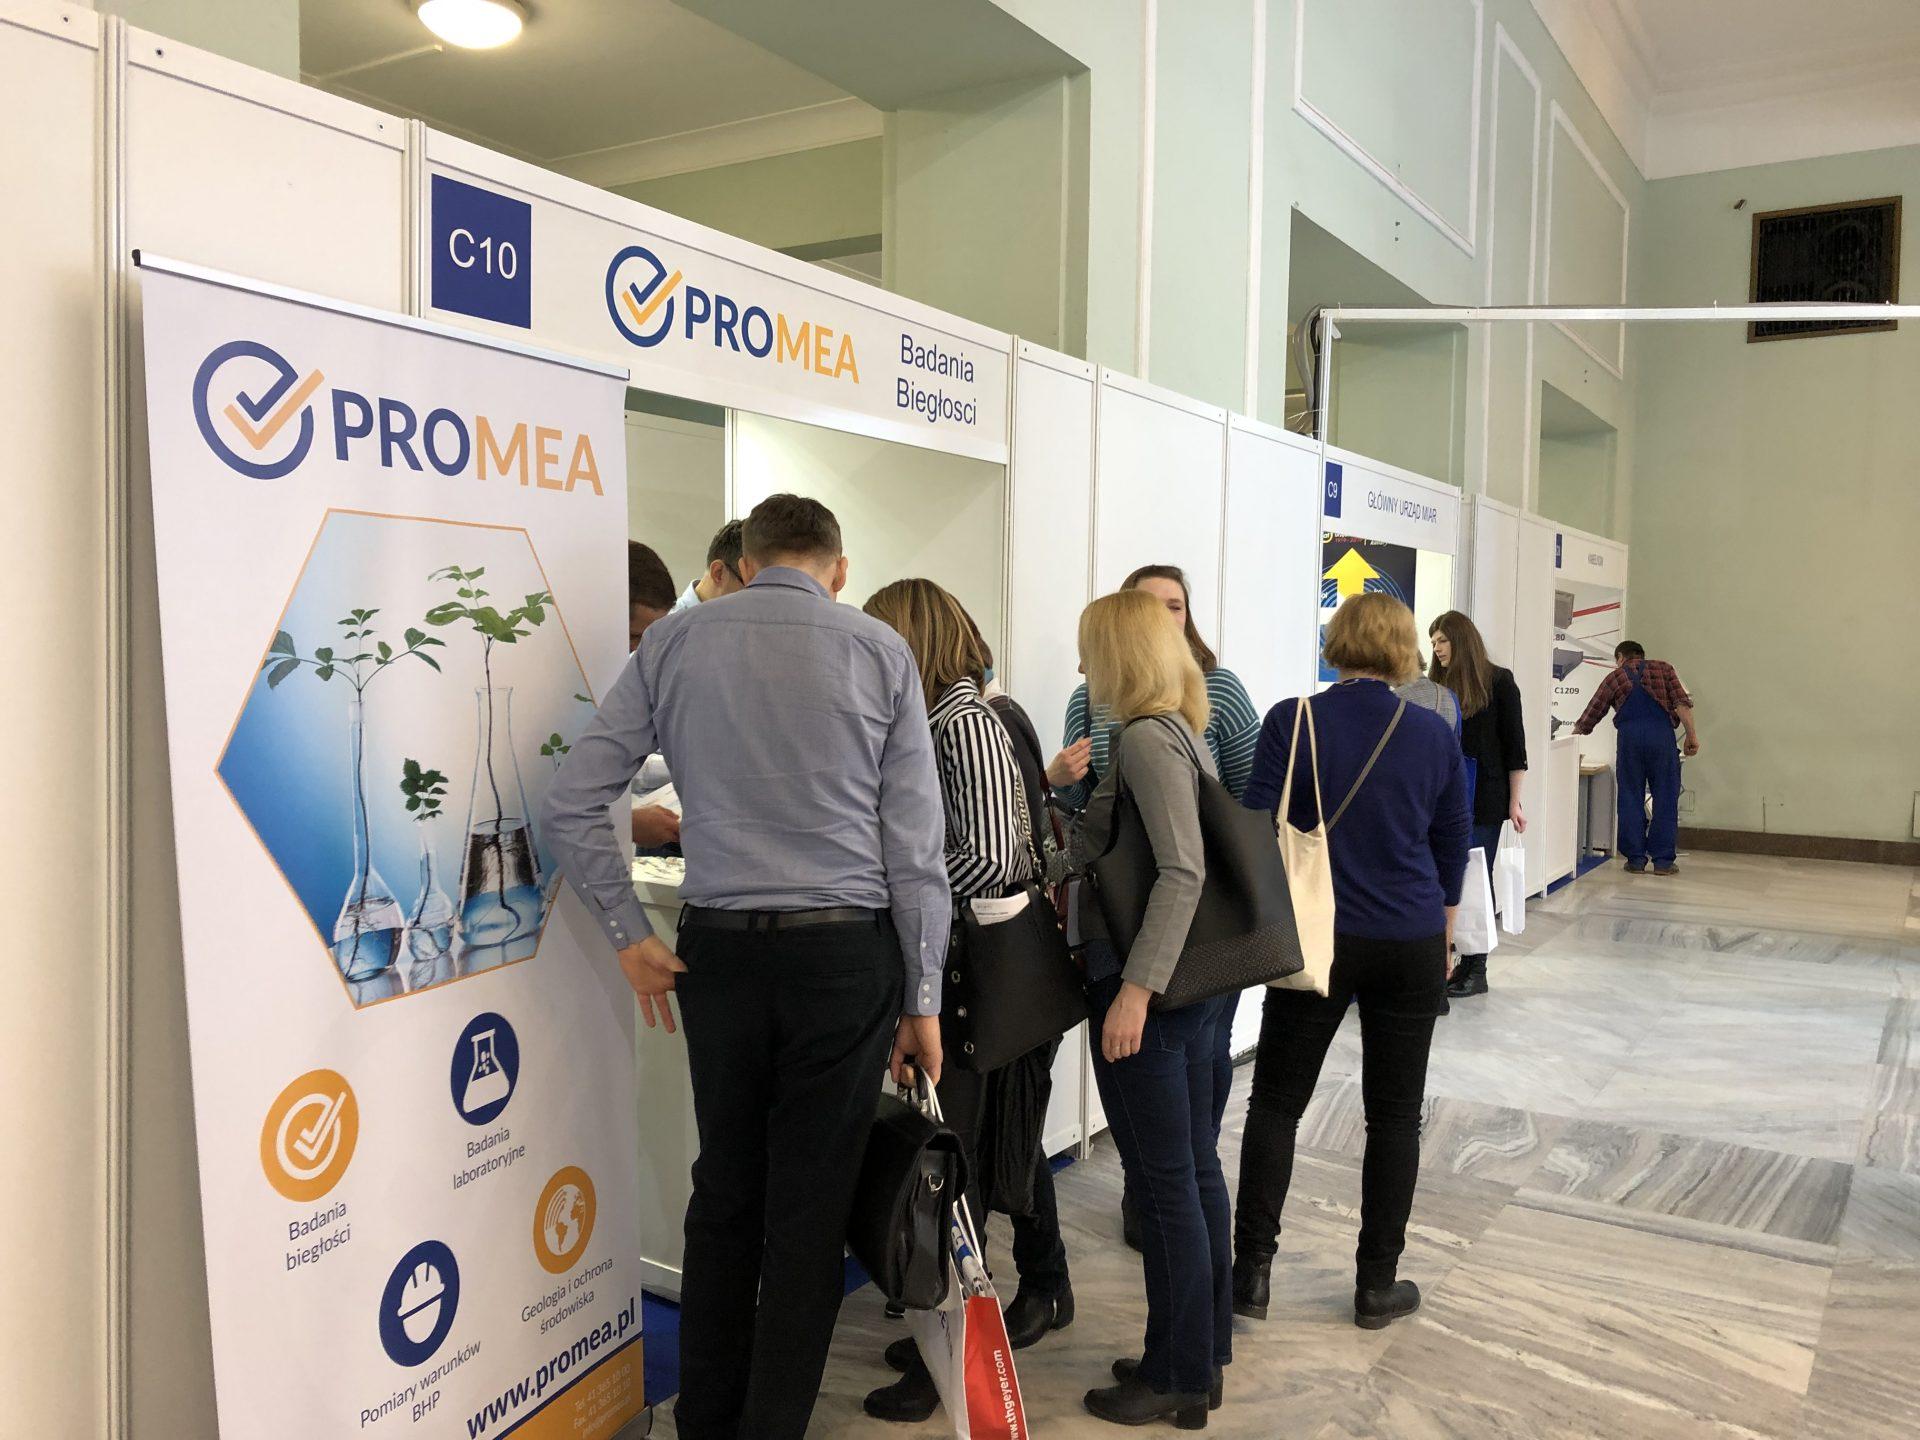 Marzec 2019, Targi Eurolab, Warszawa